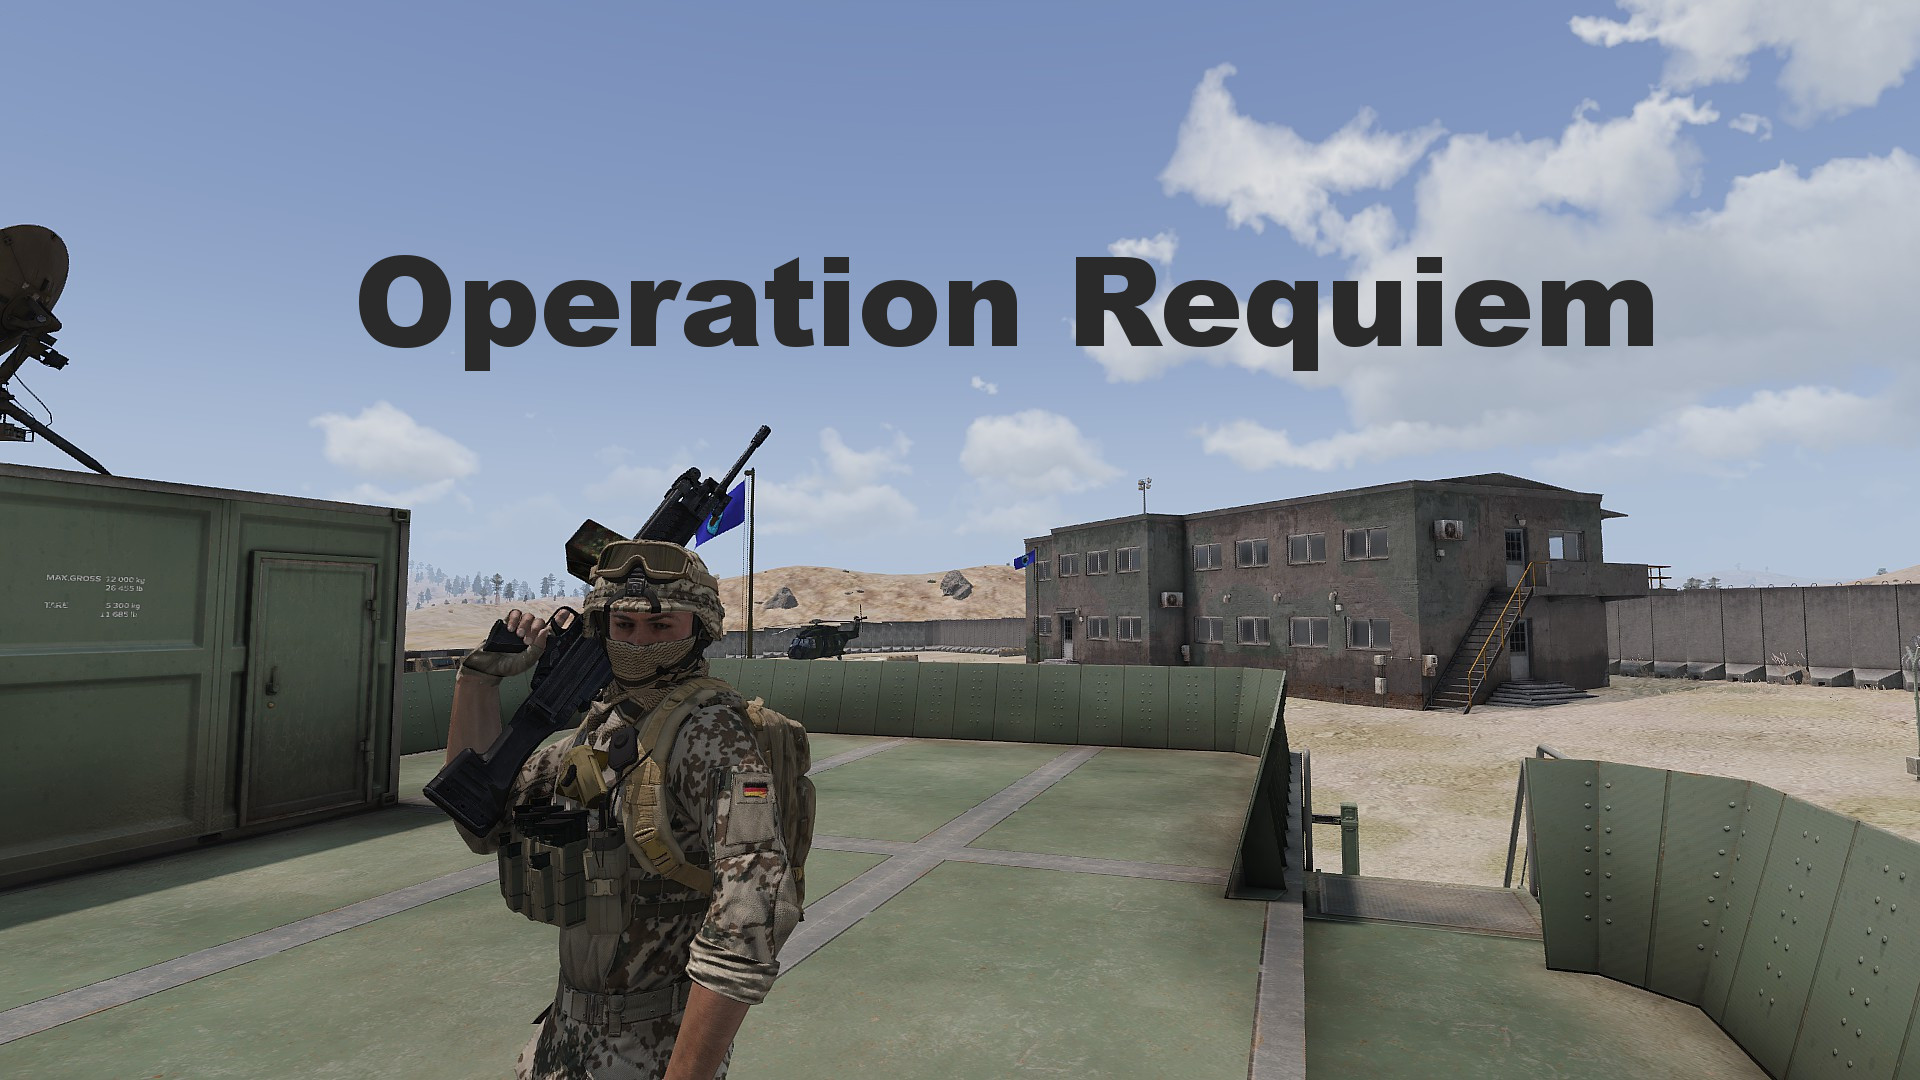 [Bild: Operation_Requiem.jpg]